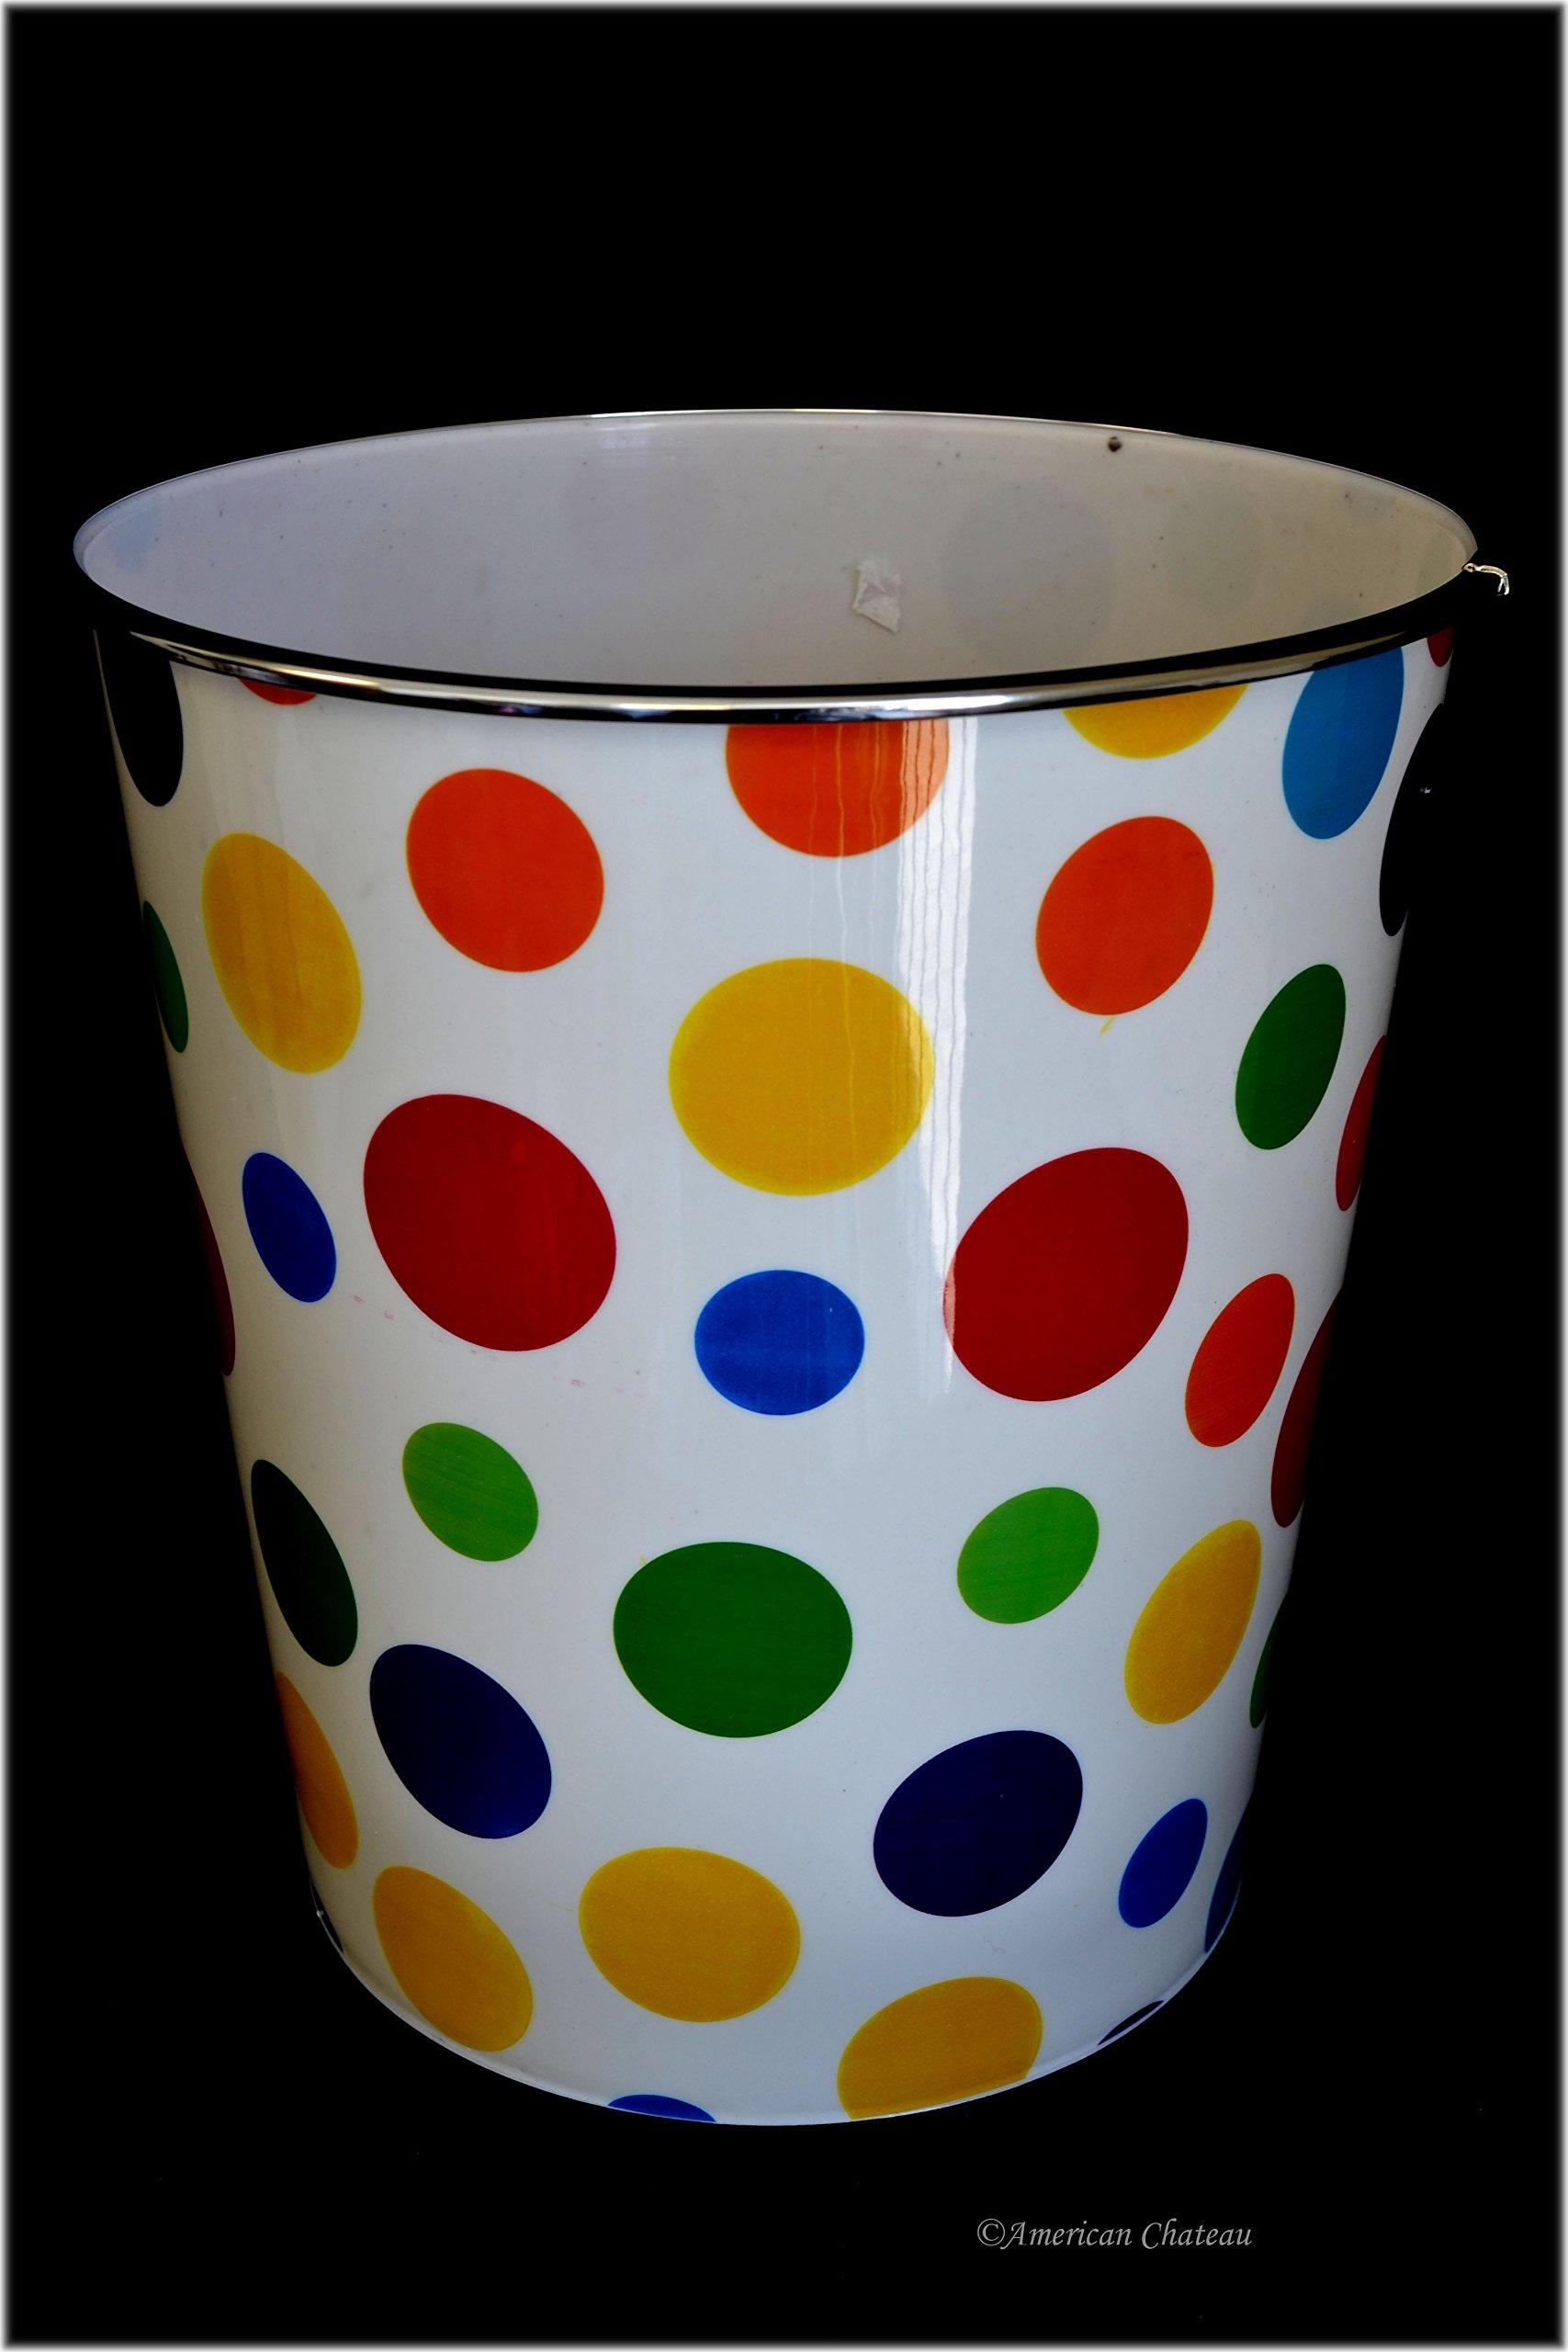 American Chateau Bathroom/Kids Room 10'' Retro Polka Dots Waste Basket Trash Can Garbage Bin